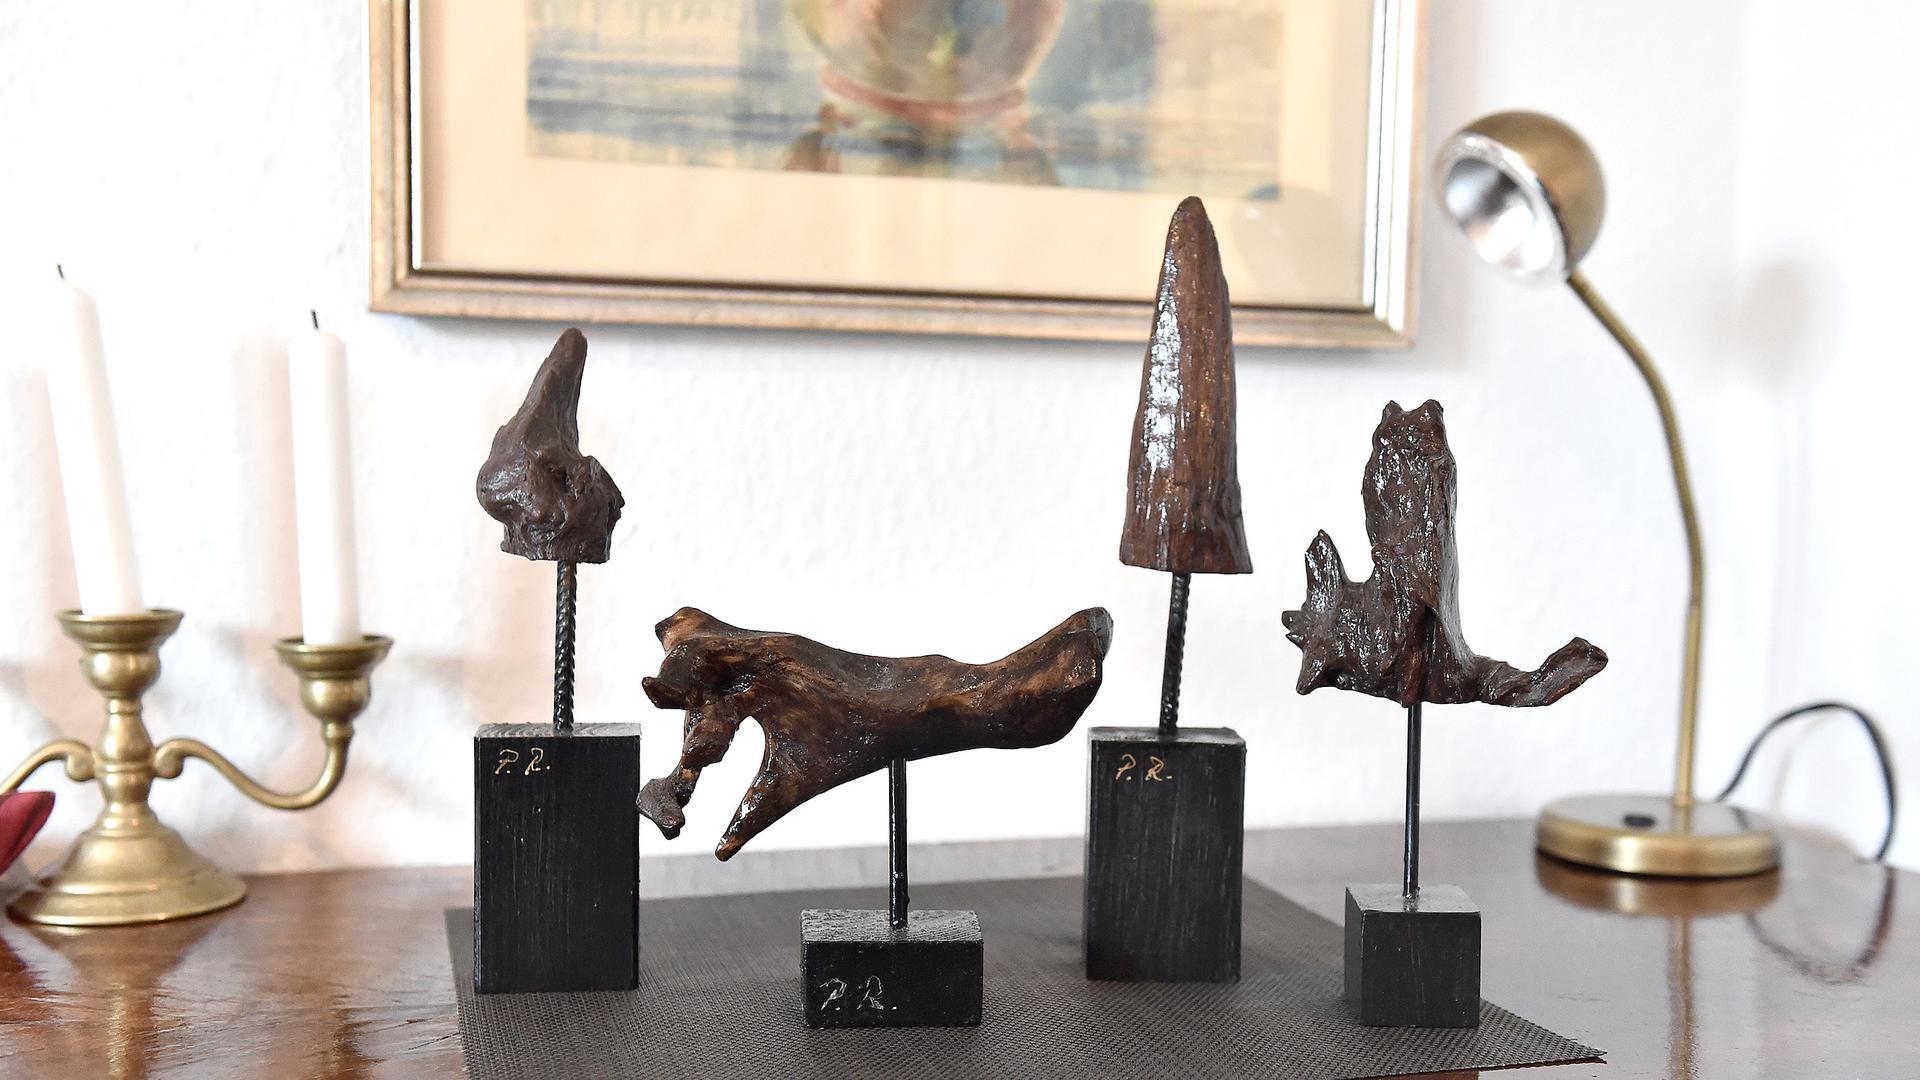 Paul Rapp macht Kunst aus Holz mit der Kettensäge